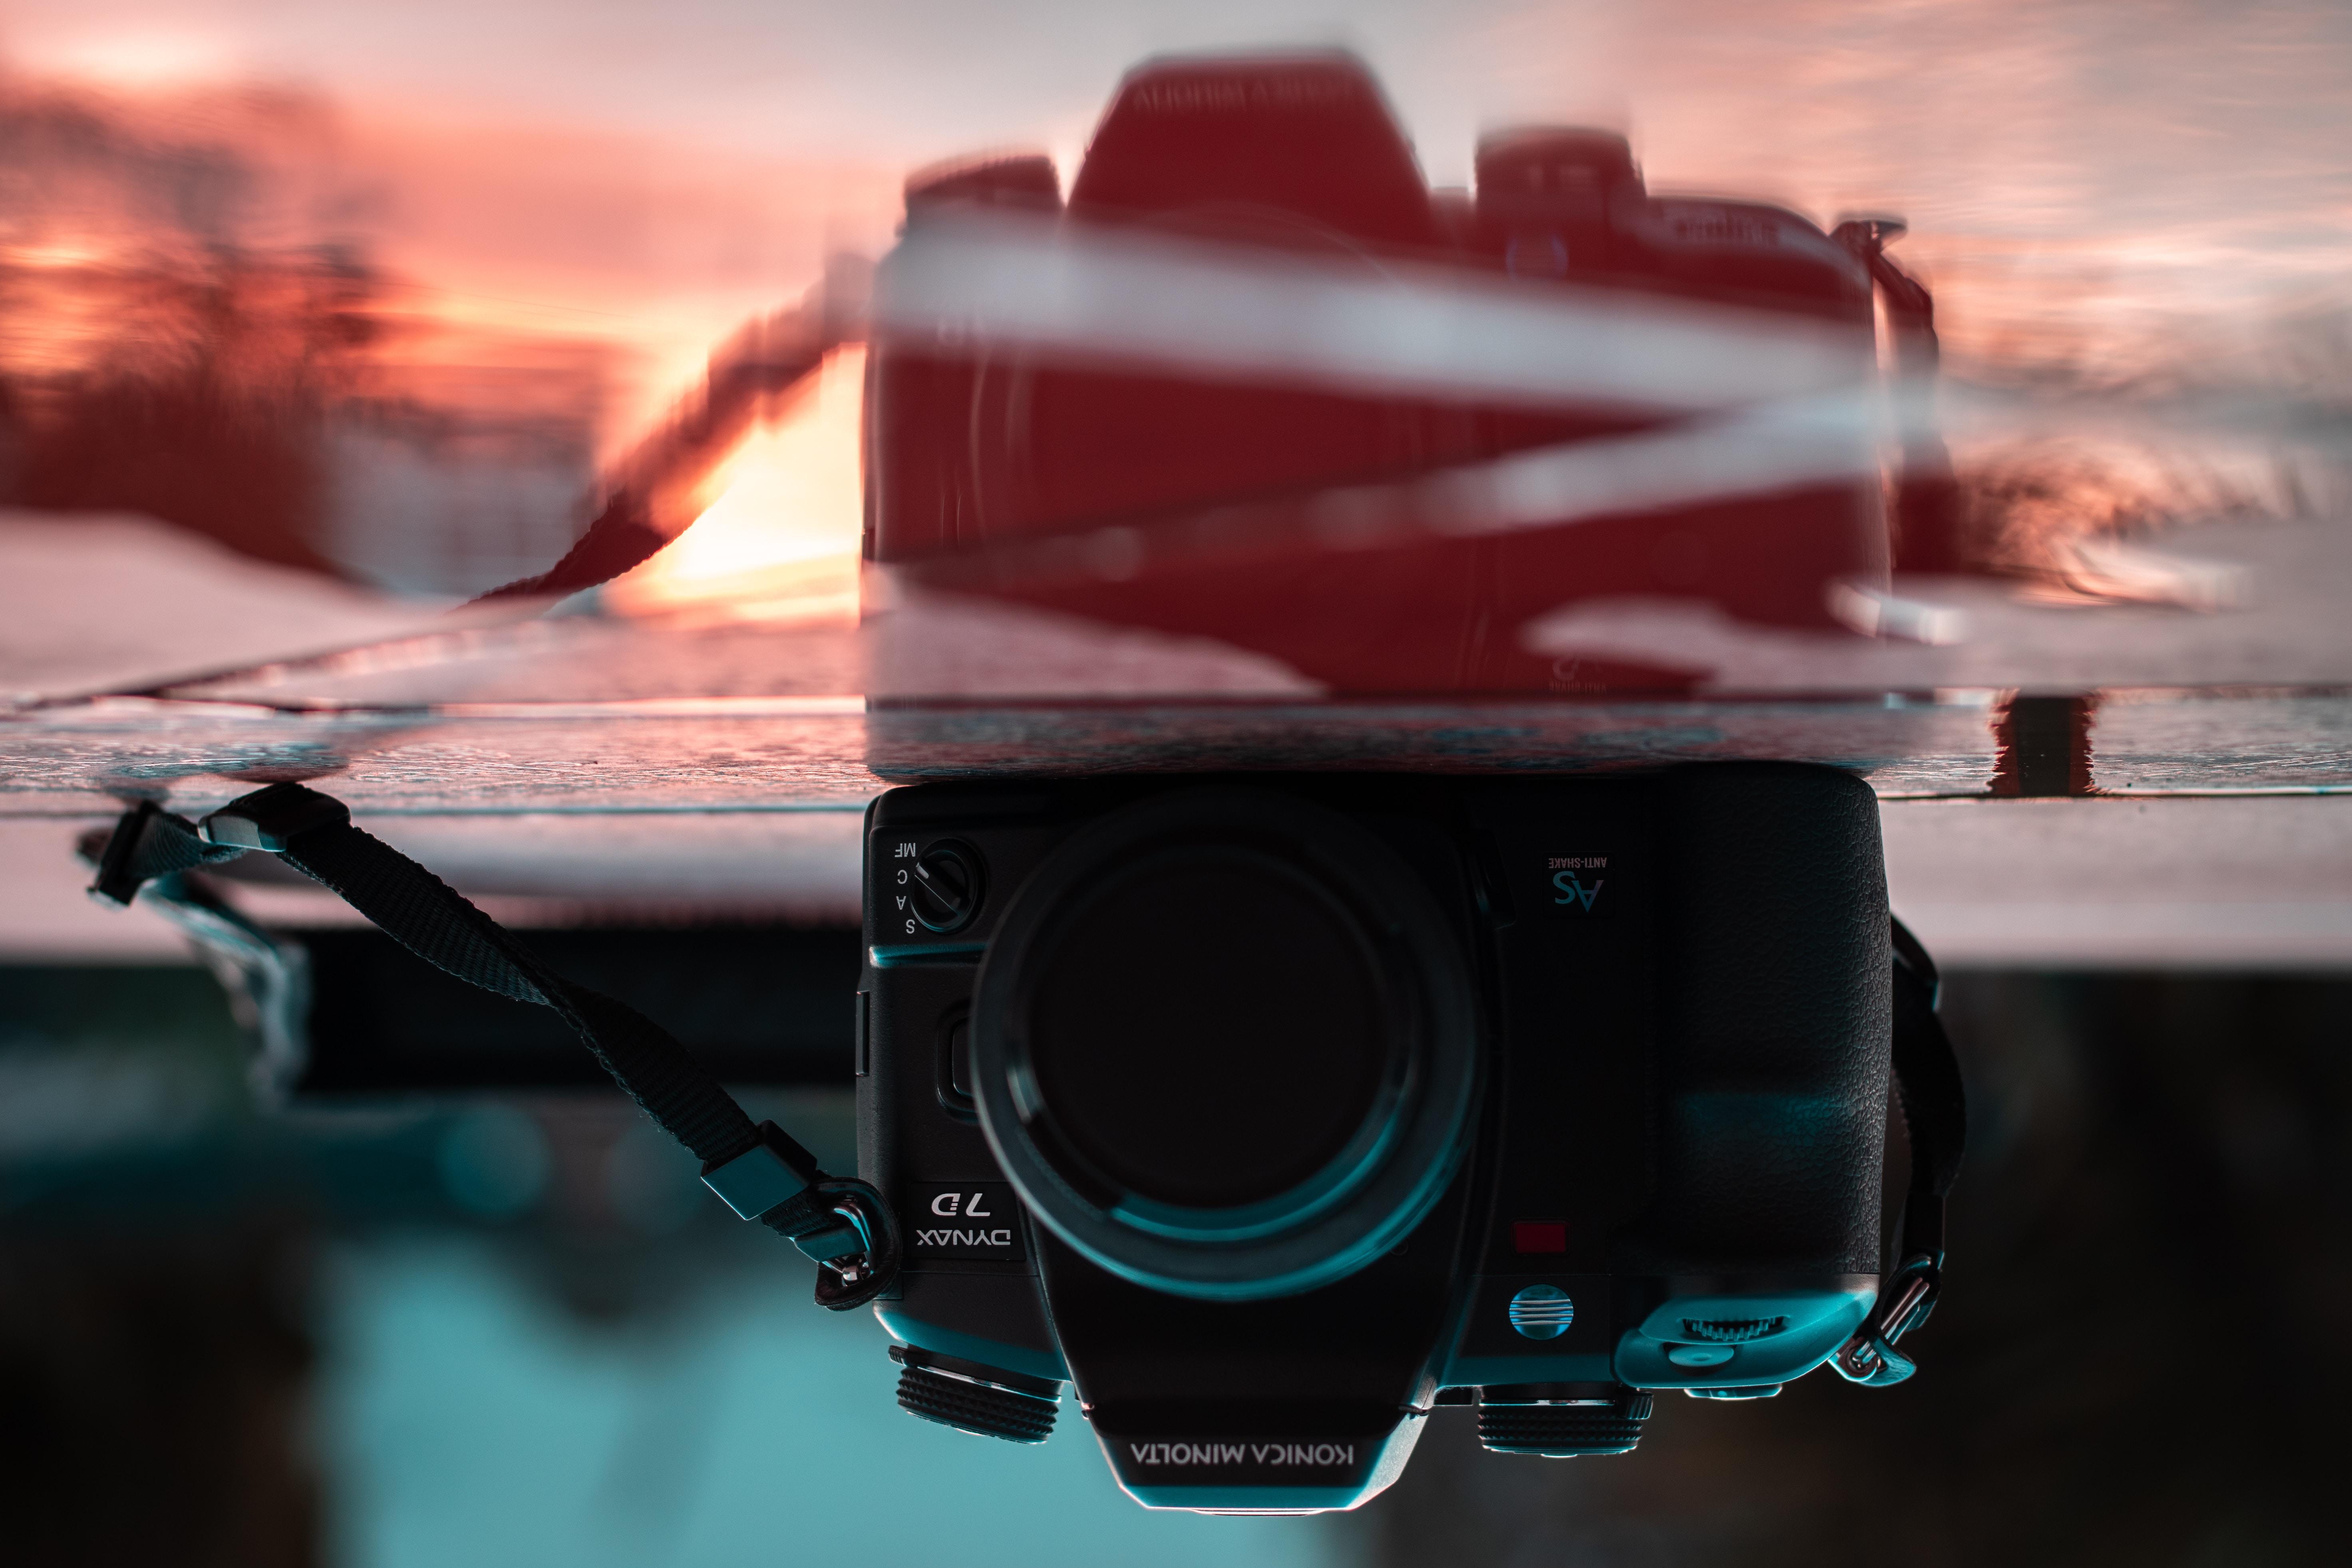 reflection photo of bridge camera